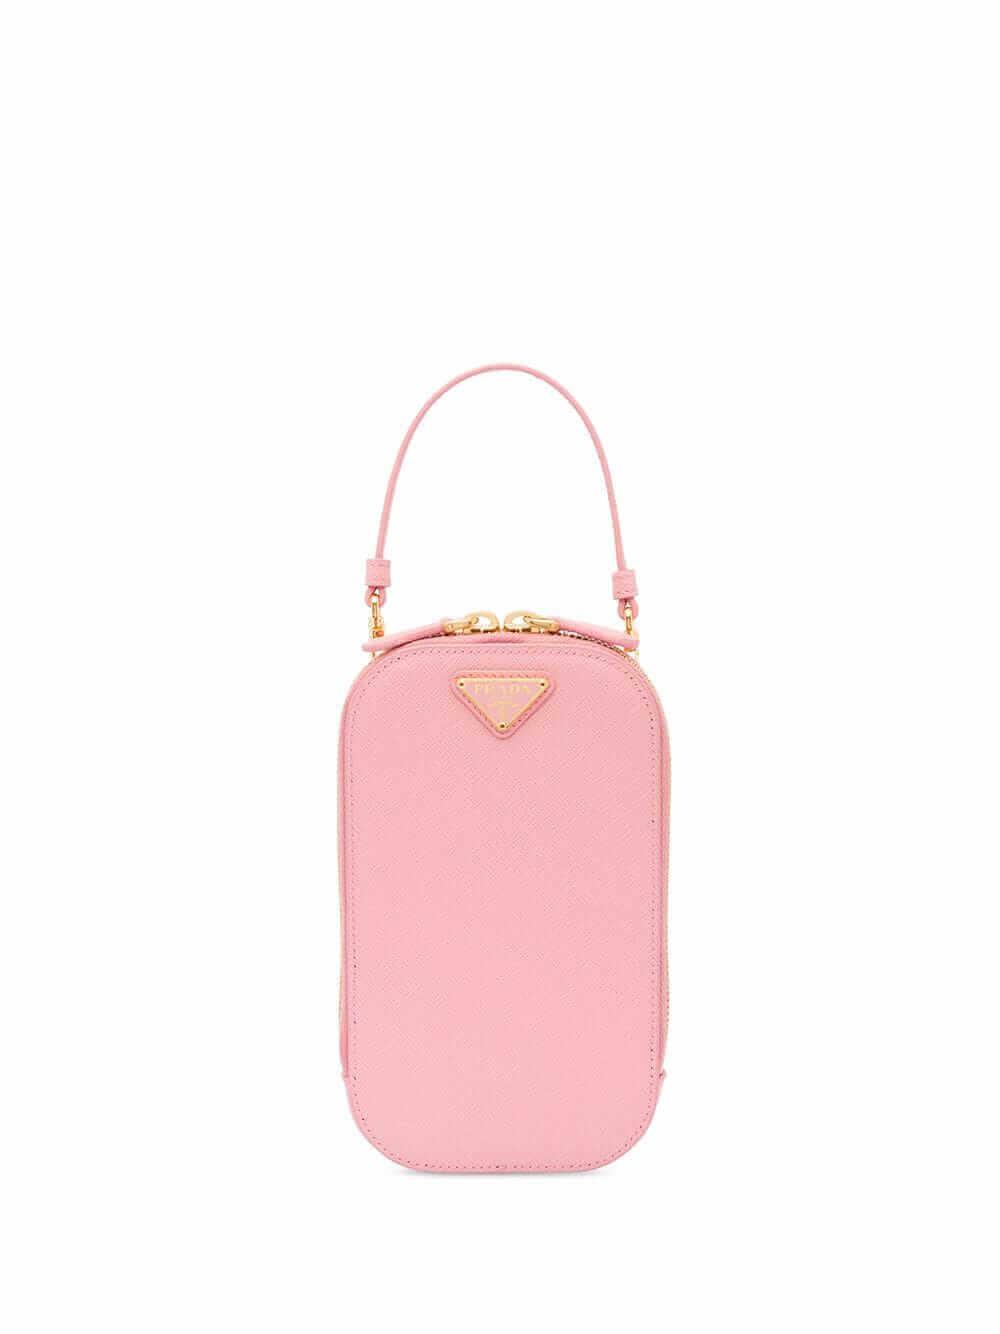 Farfetch - PRADA saffiano mini-bag